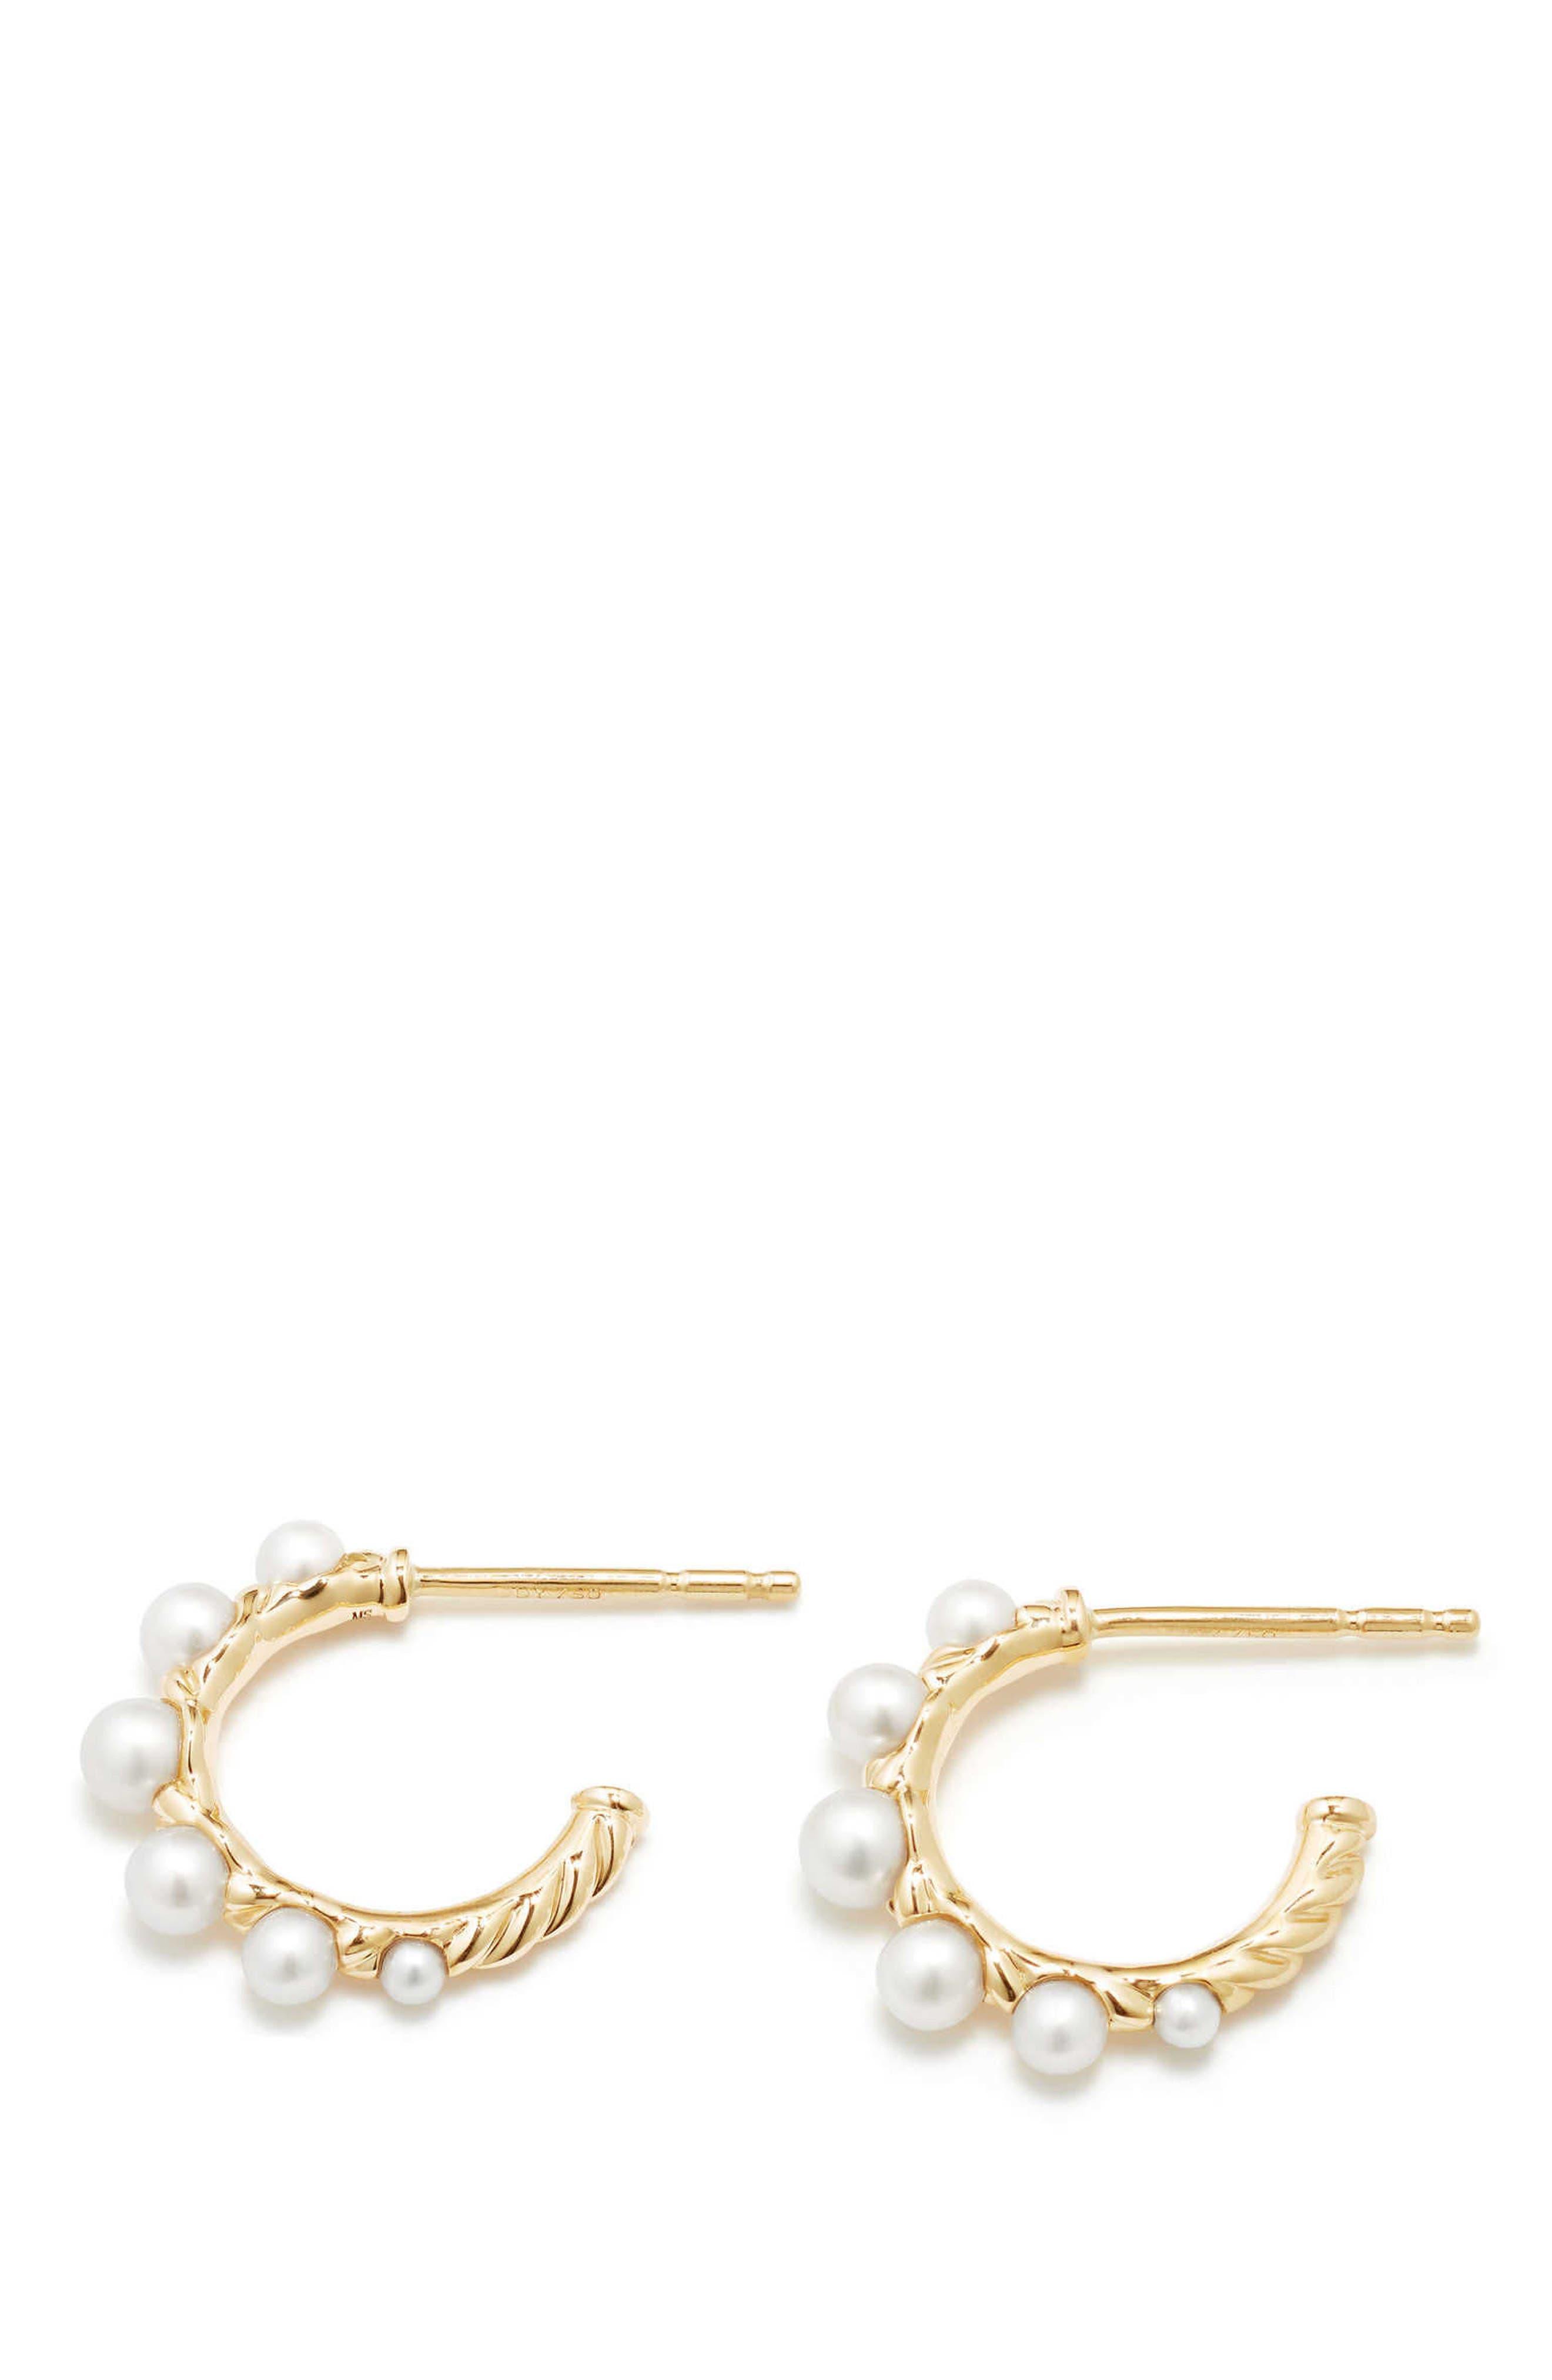 Main Image - David Yurman Petite Perle Graduated Pearl Hoop Earrings in 18K Gold